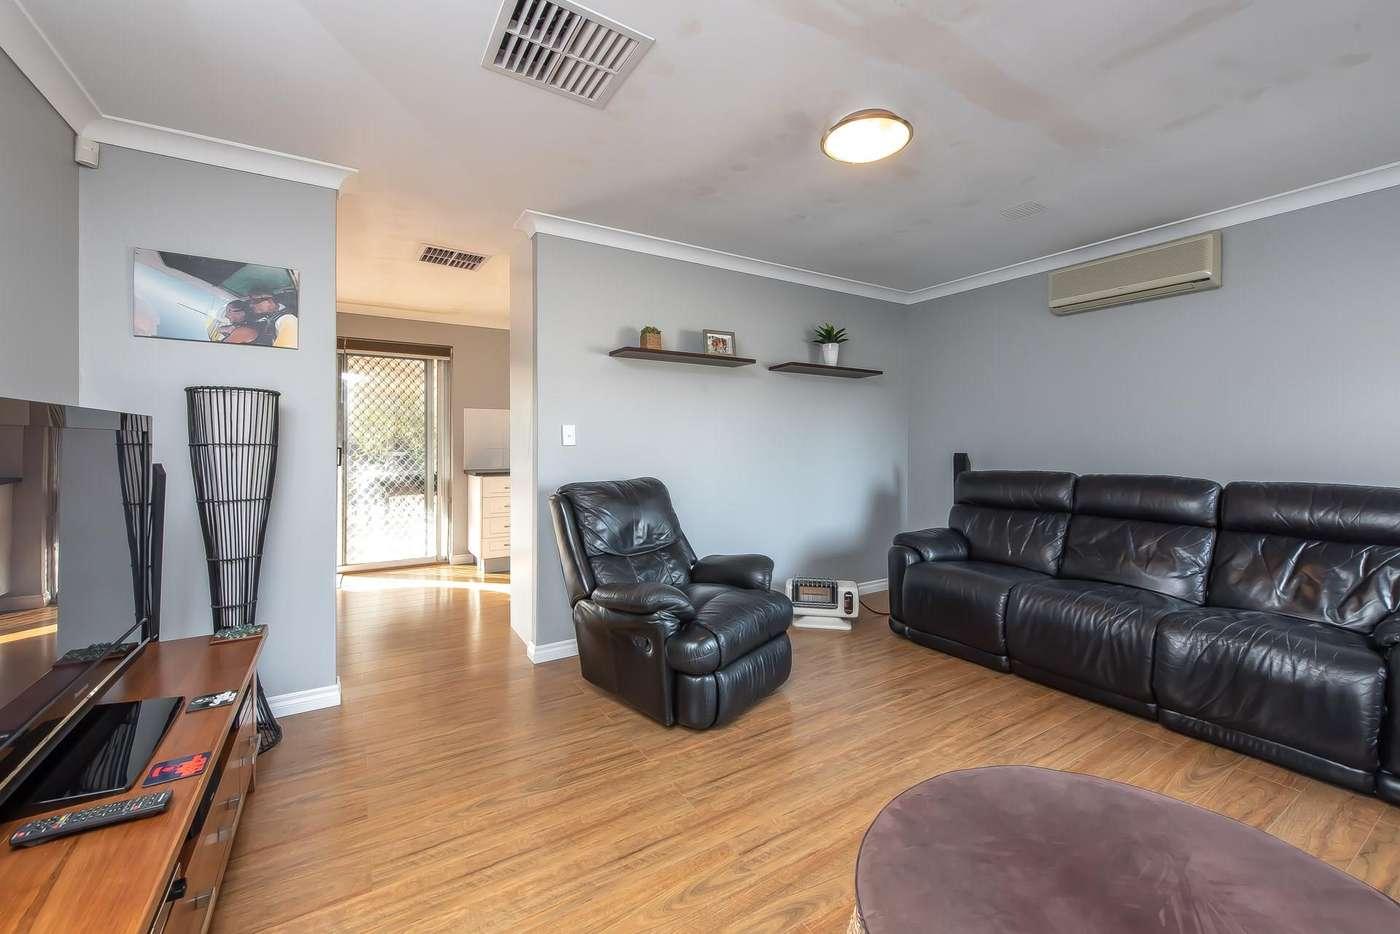 Main view of Homely house listing, 37 Dardanus Way, Heathridge WA 6027